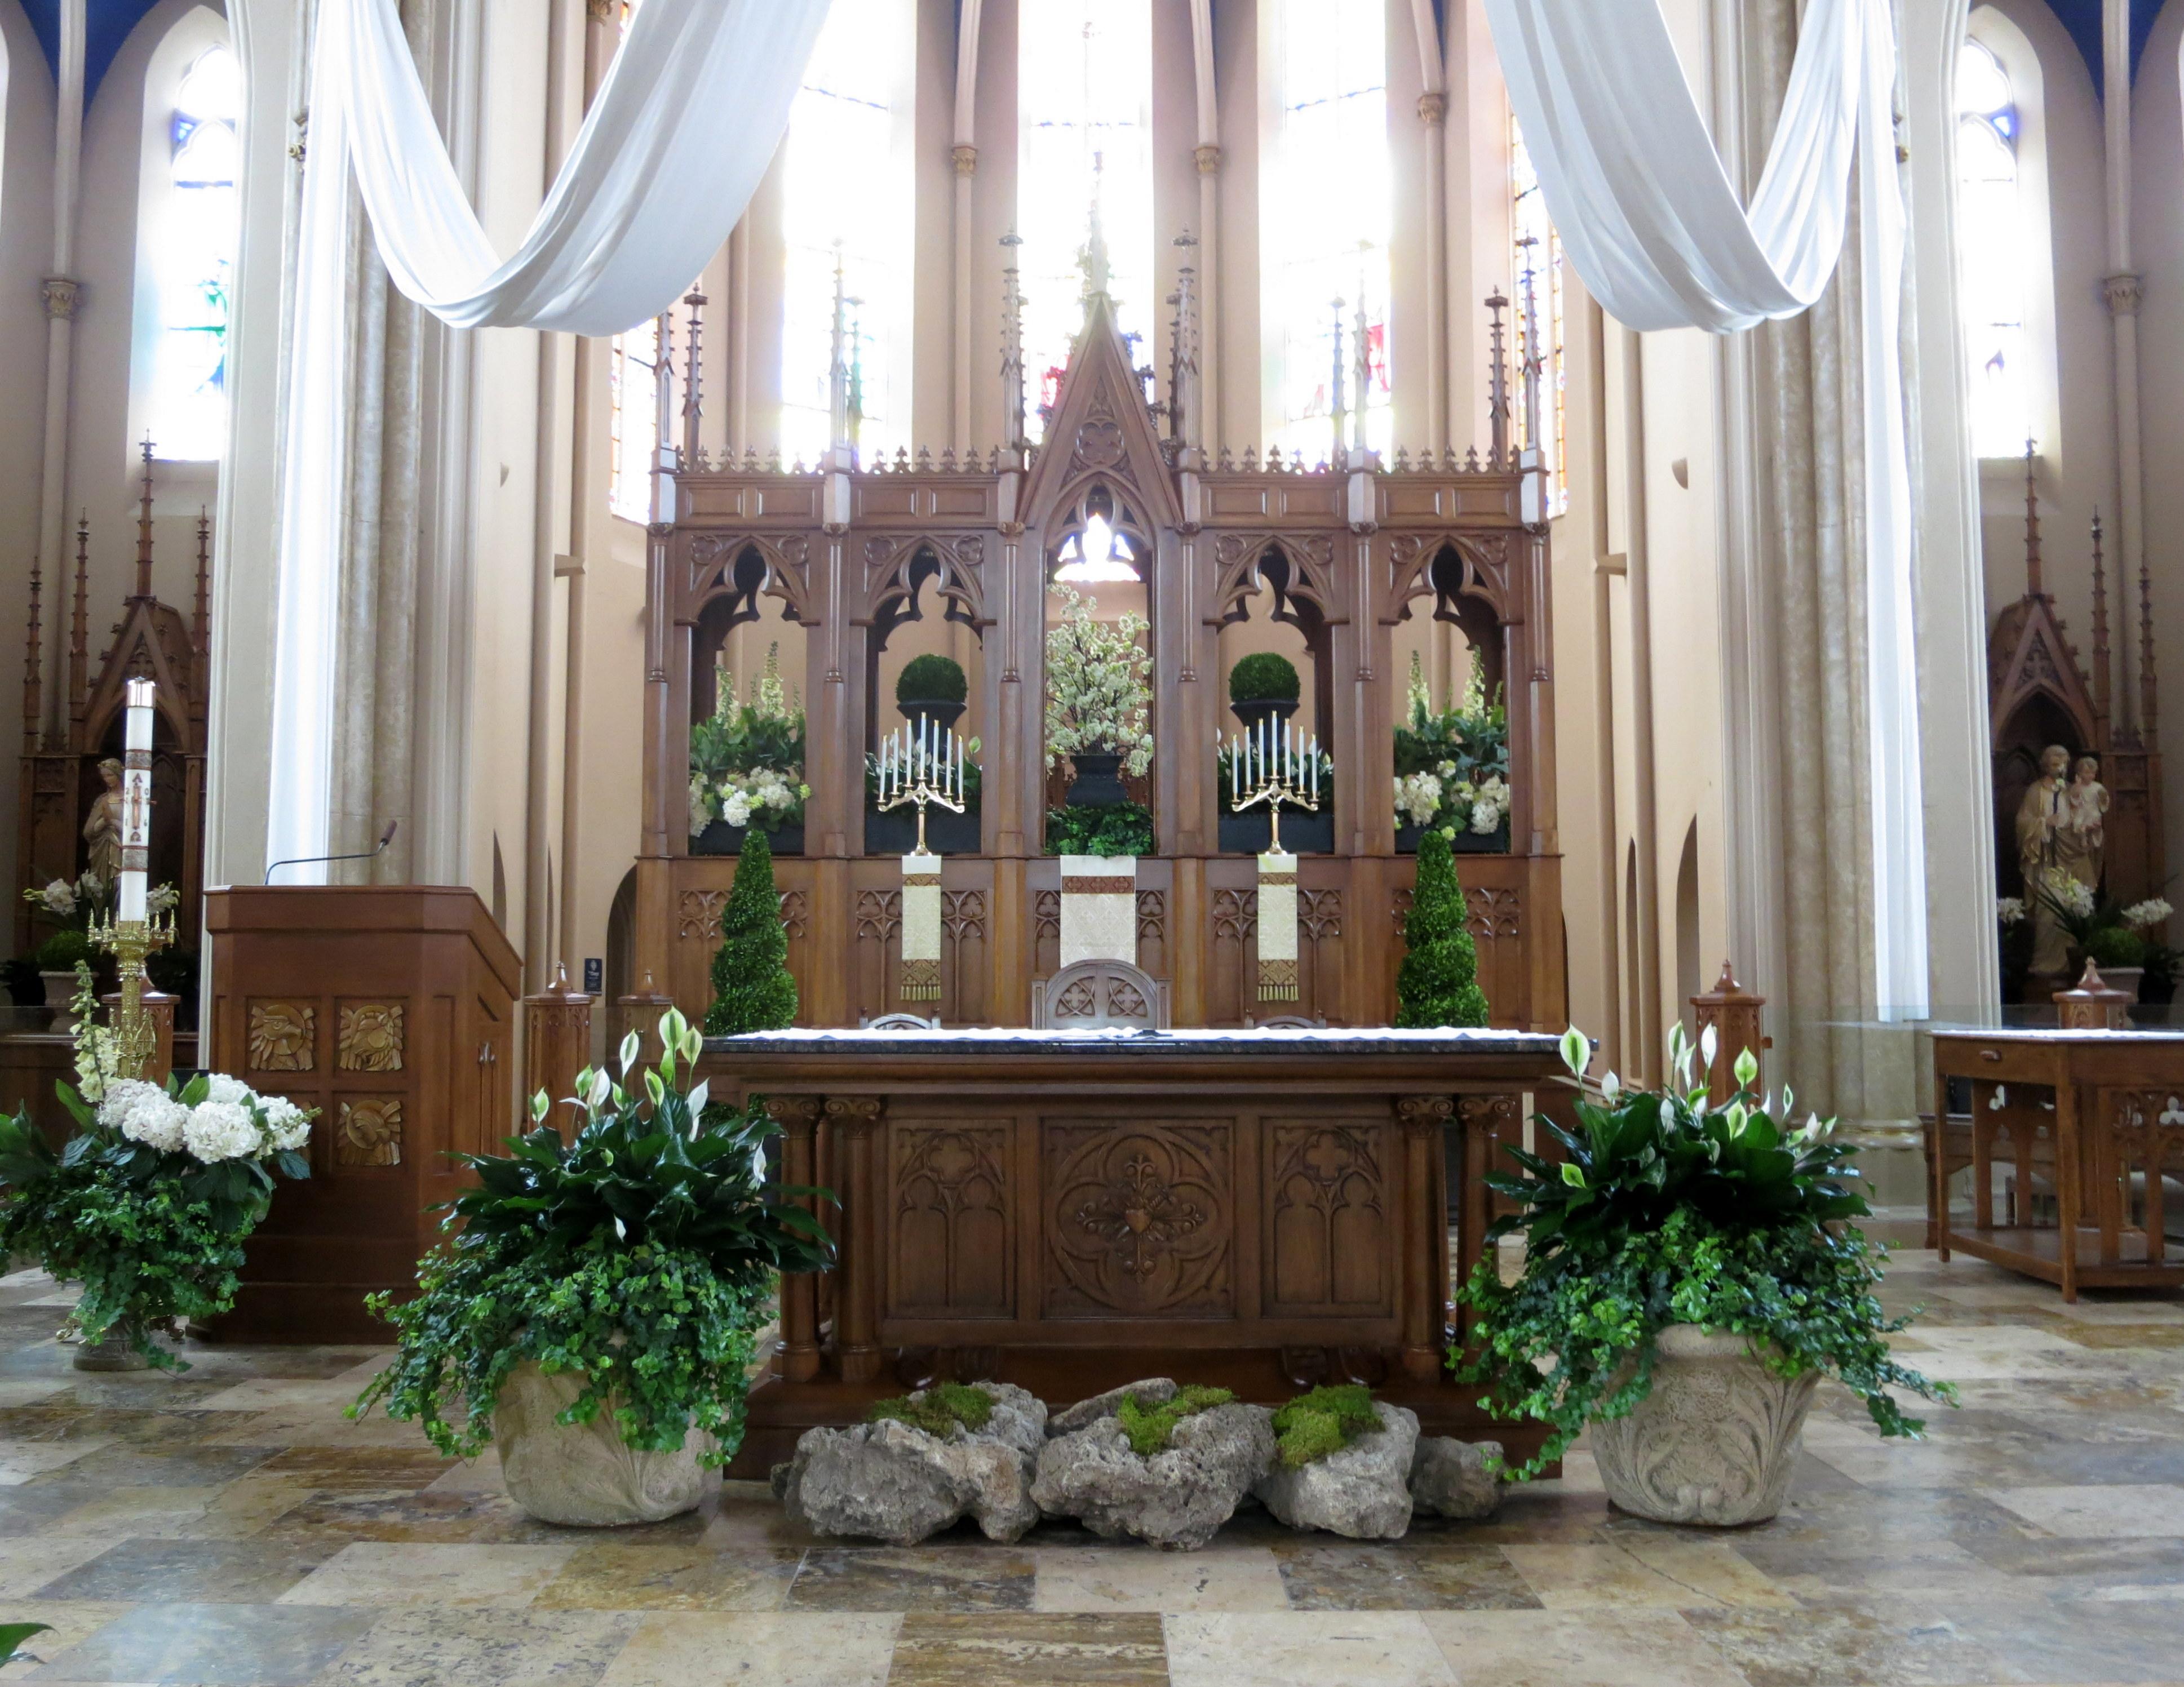 Ideas For Decorating A Church Sanctuary | Joy Studio ...